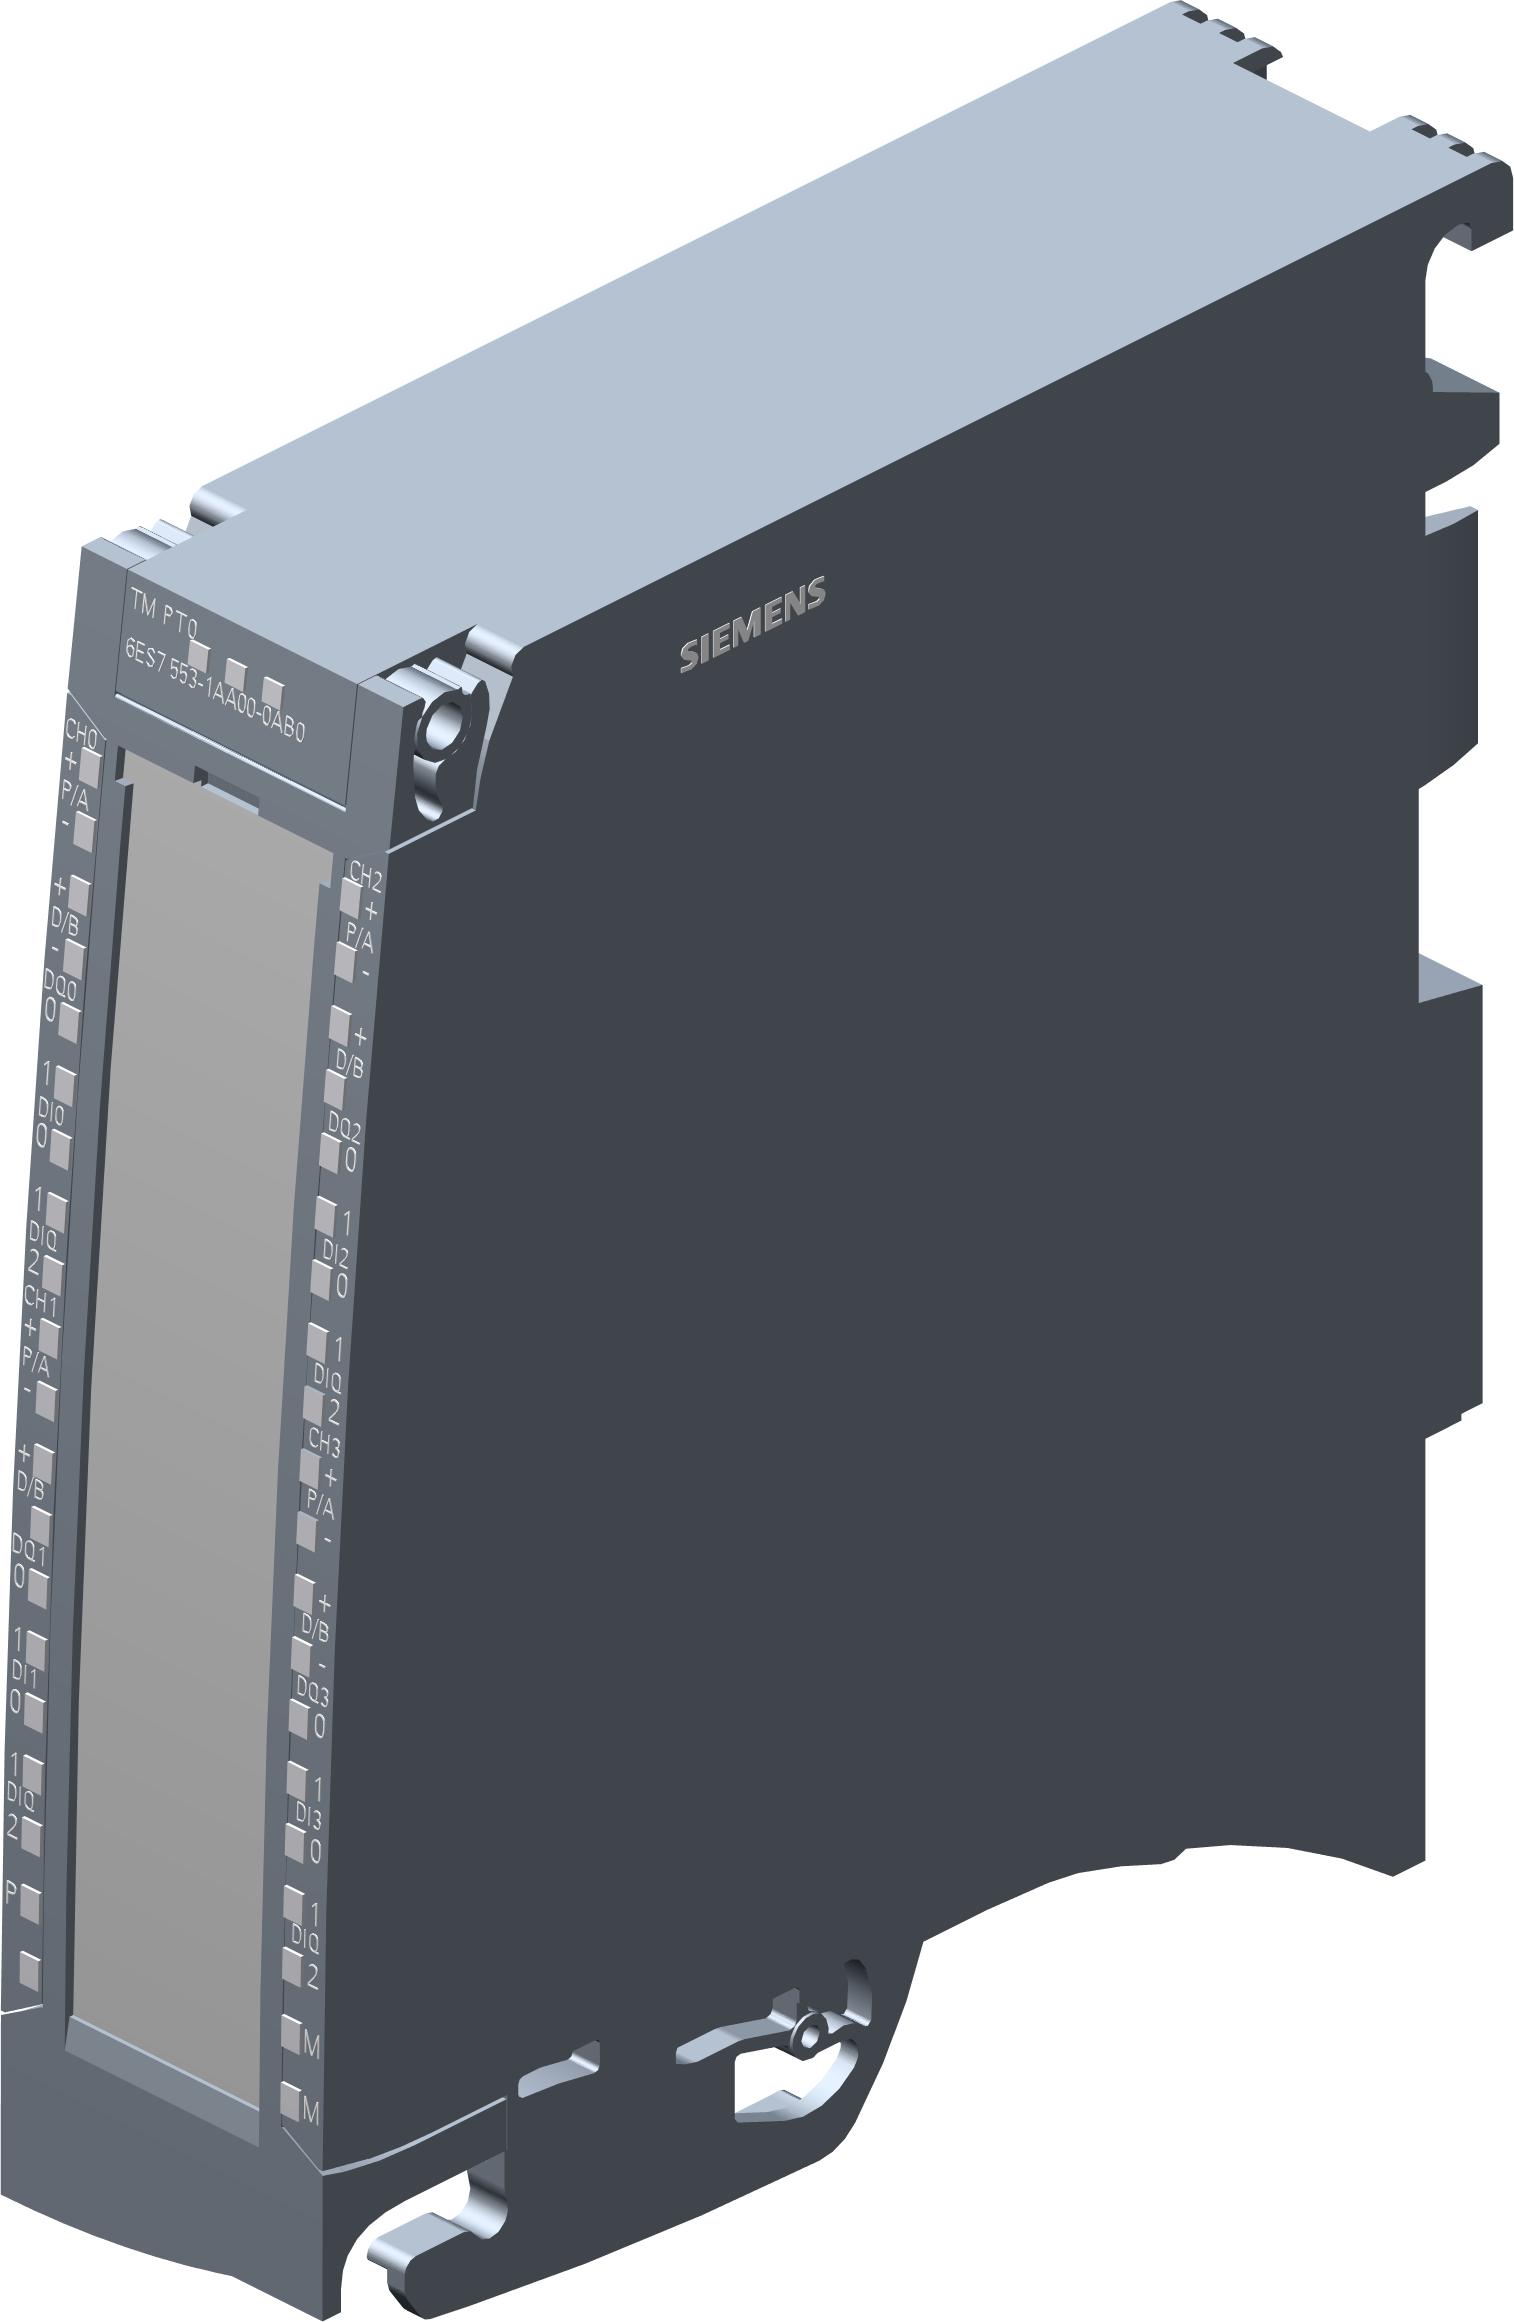 SIMATIC S7-1500, TM PTO 4 Interface board for stepper drives 4 Channels Pulse Train output PTO: 24 V, 2 DI, 1 DQ 24VDC per channel